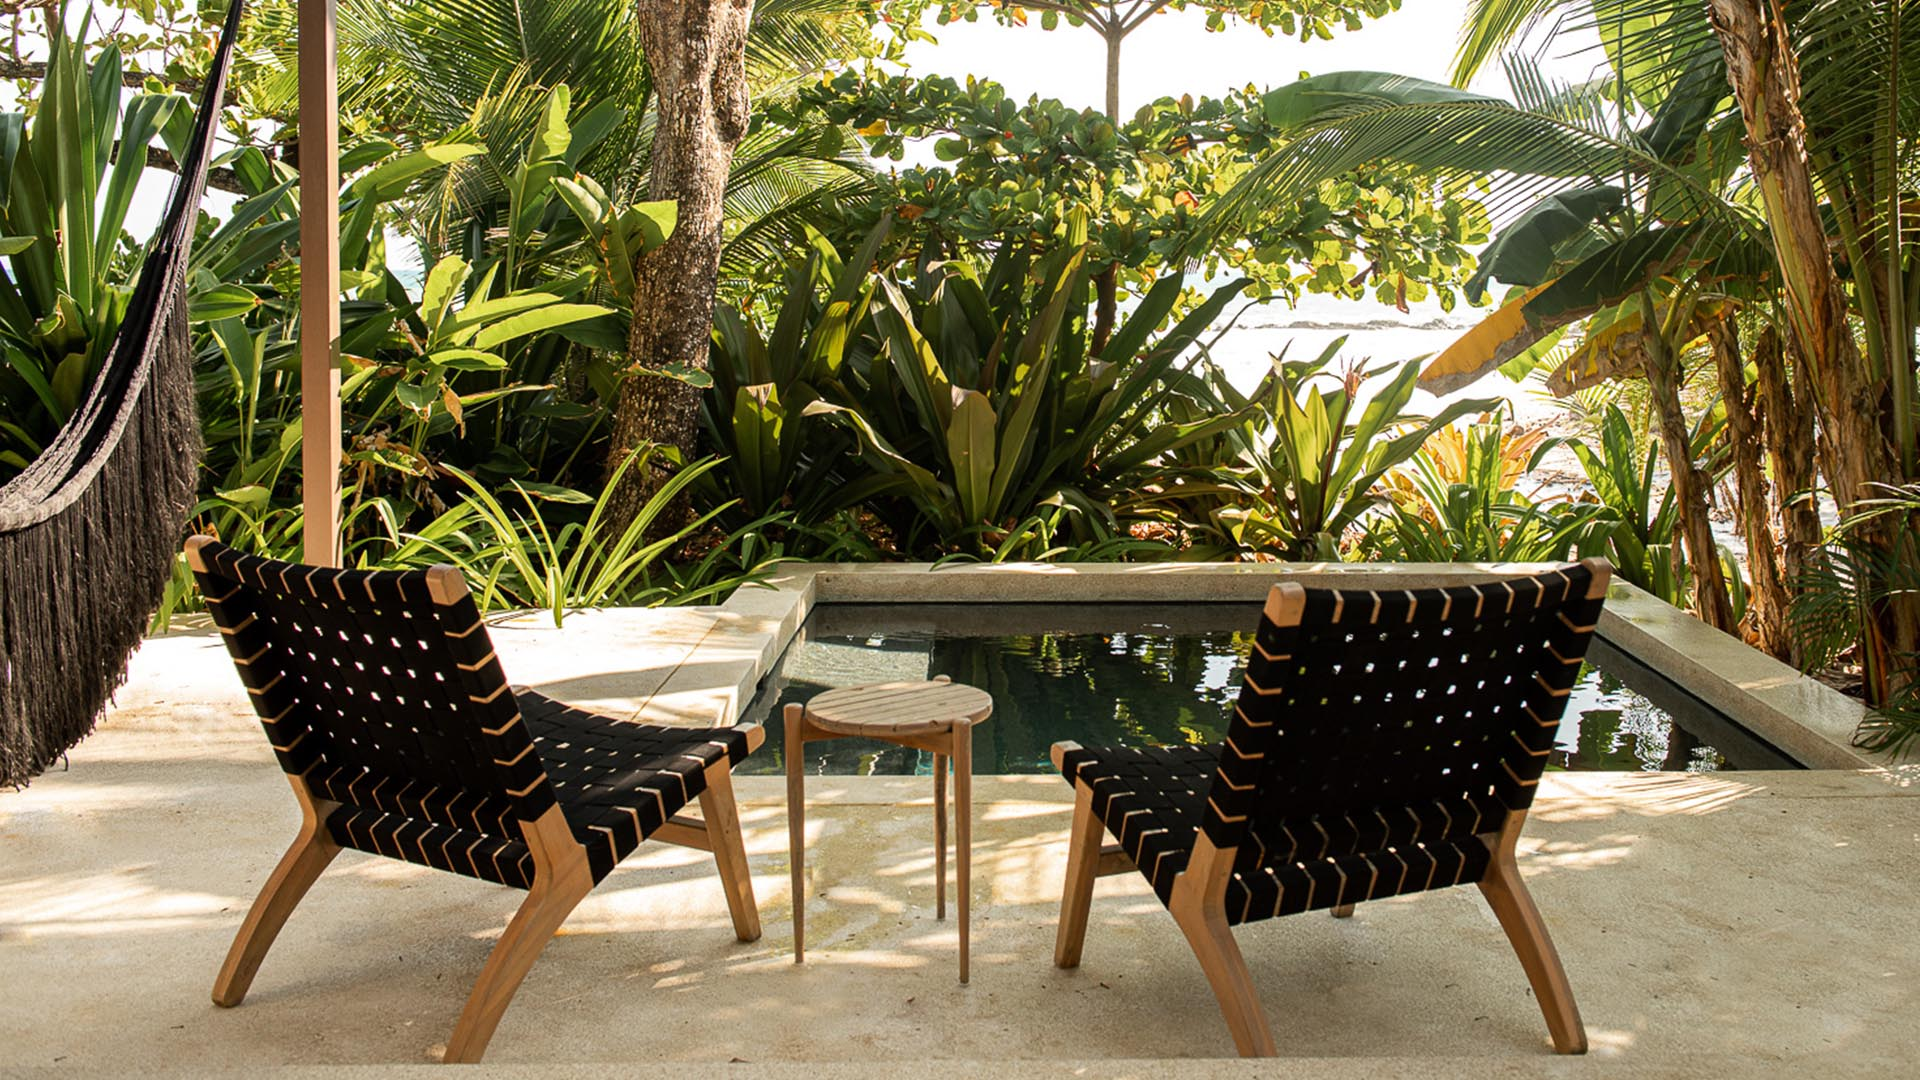 Juliet Kinsman on sustainable luxury travel after lockdown